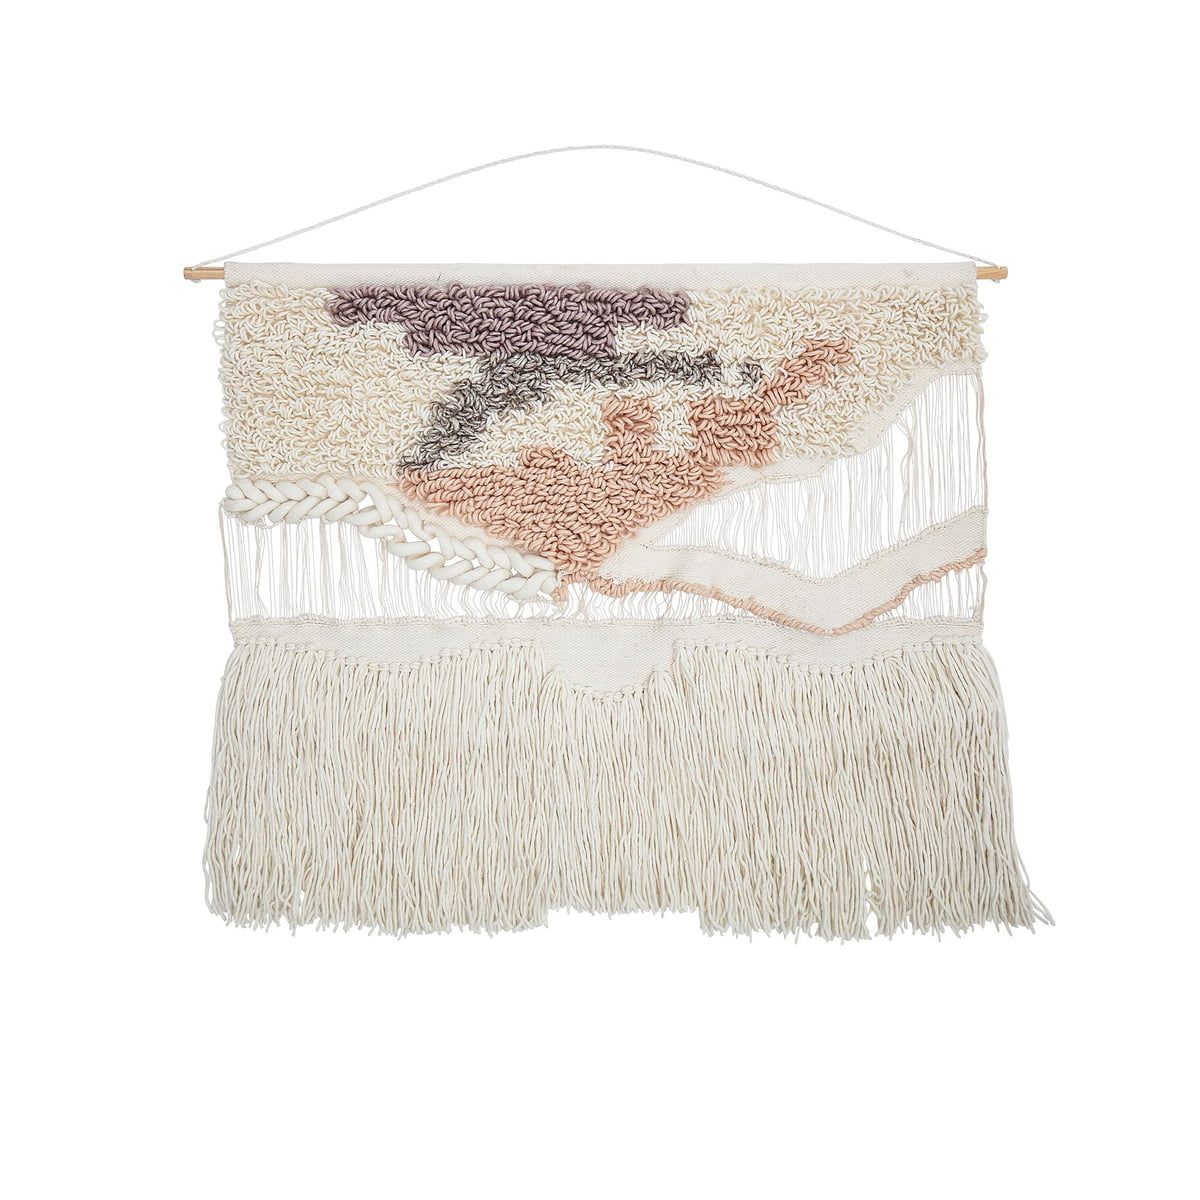 Bloomingville - Wanddekoration aus Wolle, H 95 x W 105 cm, natur   Dekoration > Wandtattoos   Bloomingville